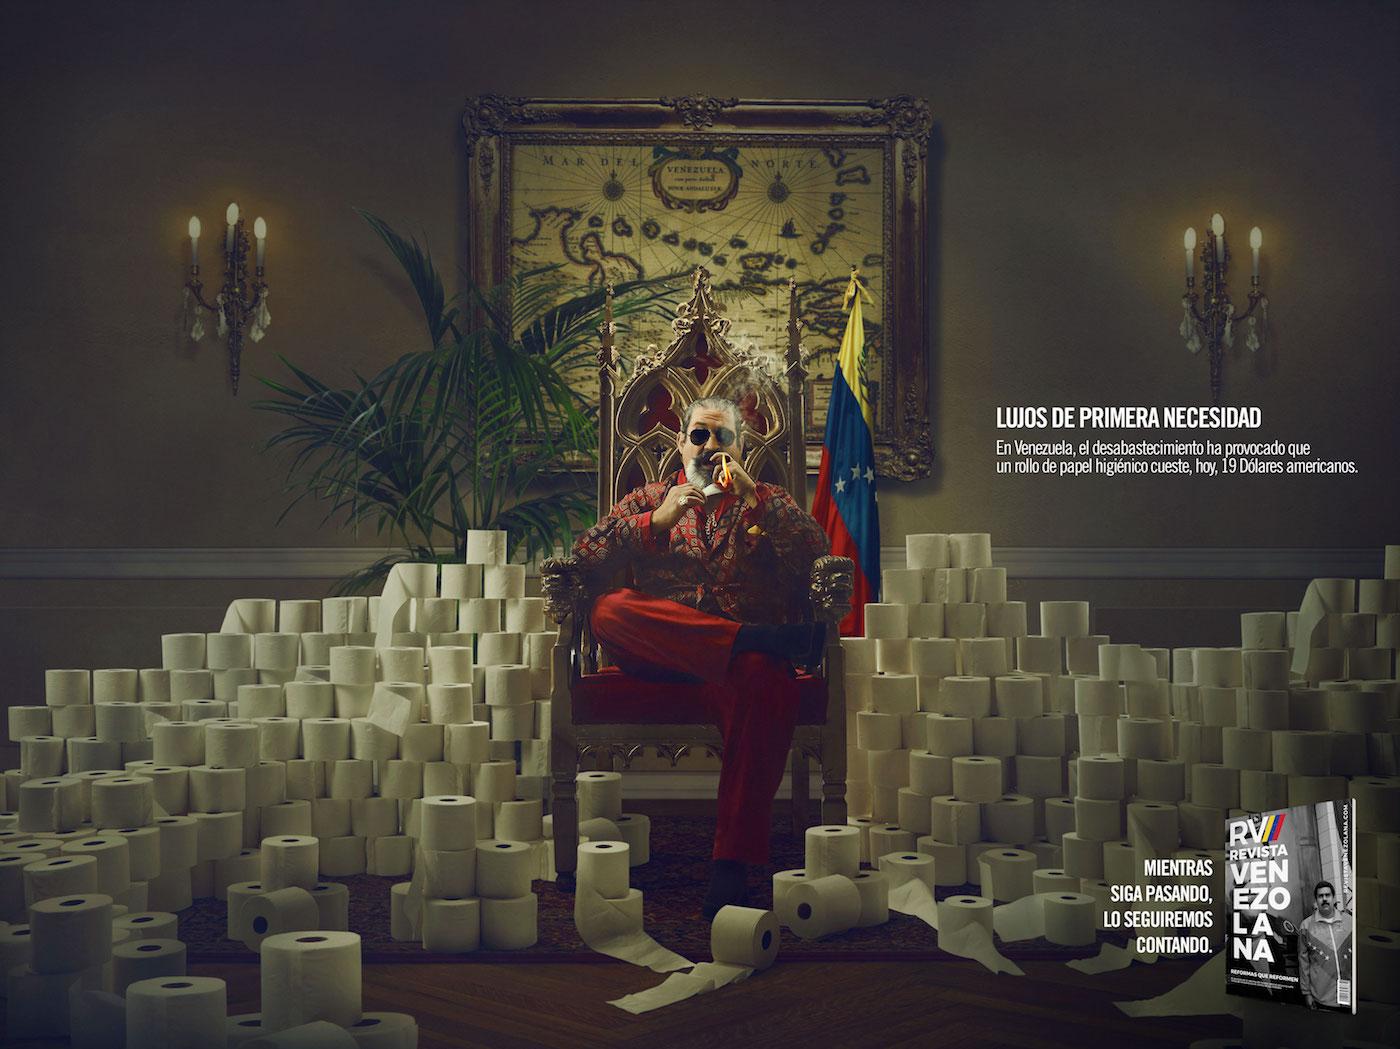 02-Grafica-Venezolana-Photography-DiegoBerro.jpg